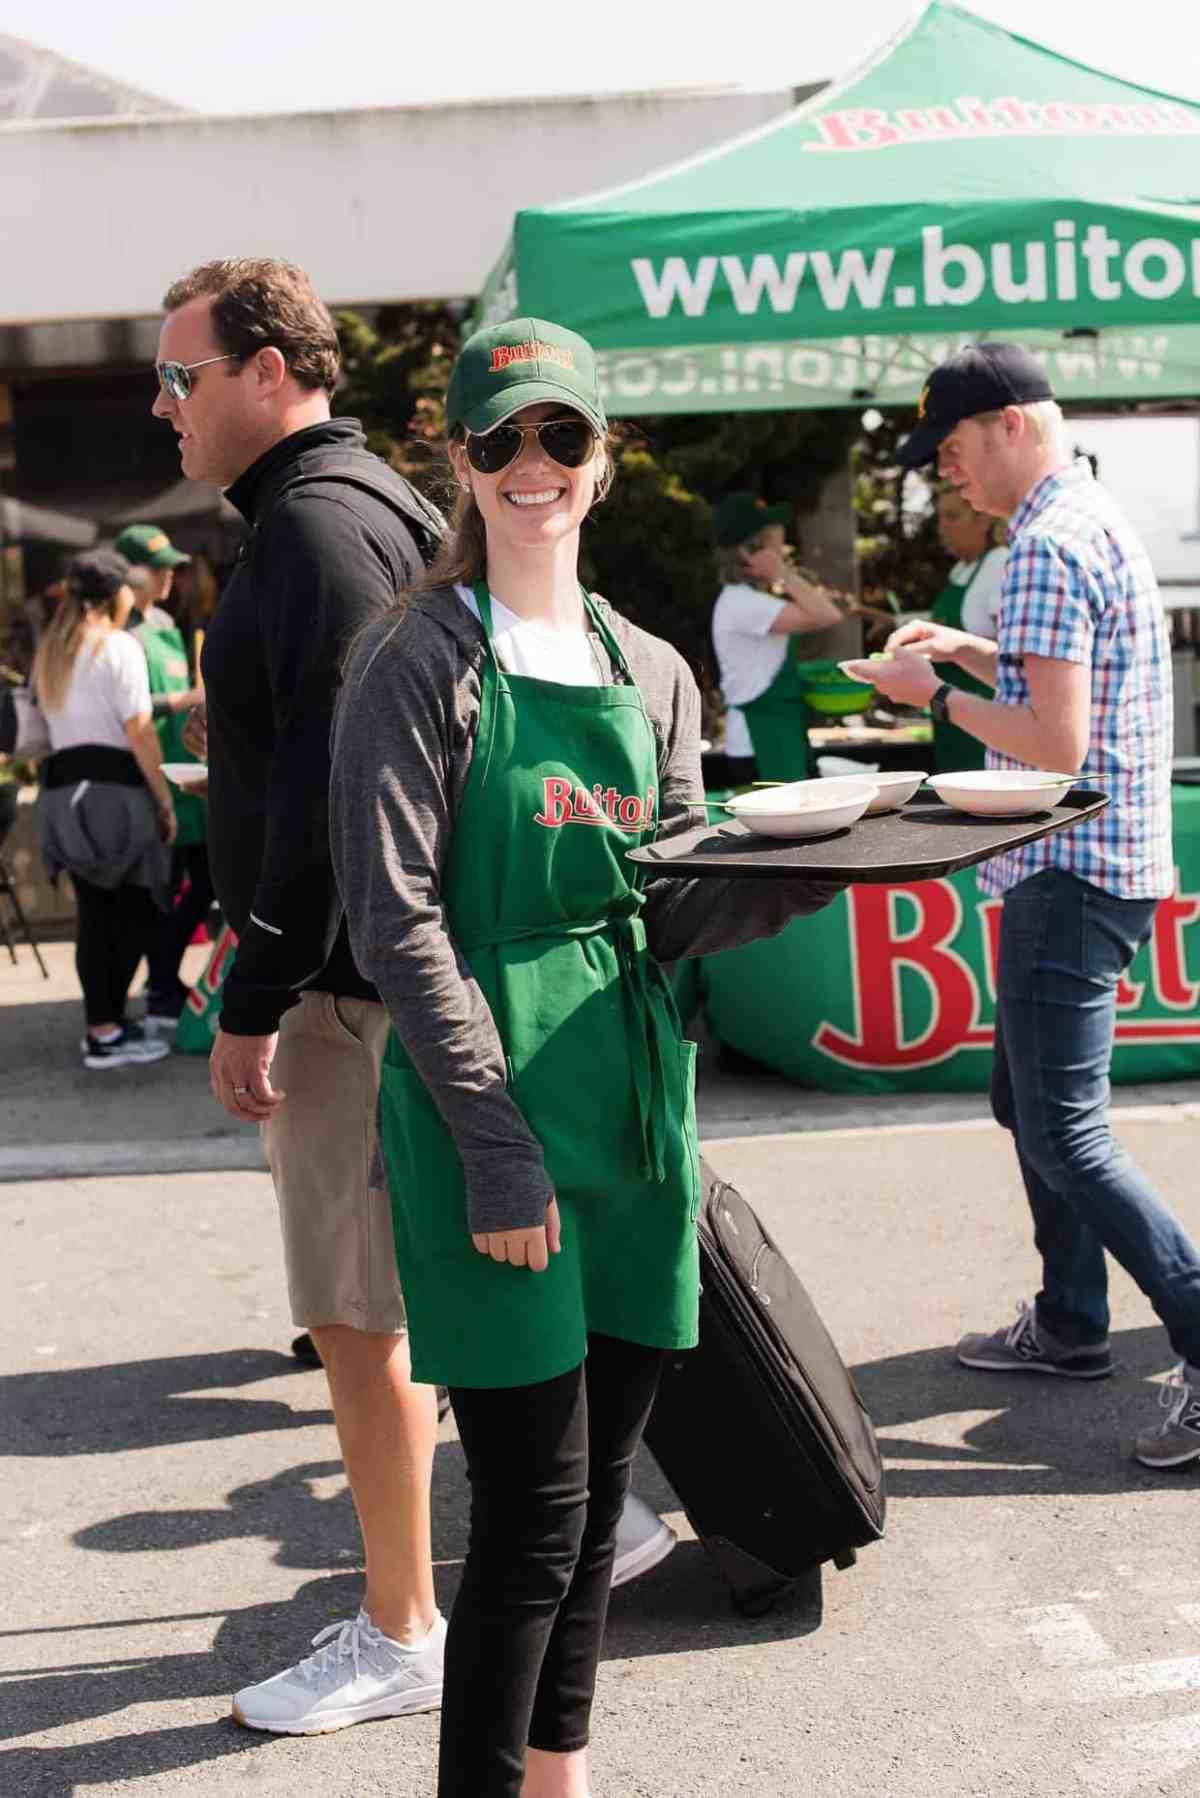 Sharing samples of BUITONI pasta at Ferry Building Farmer's Market.